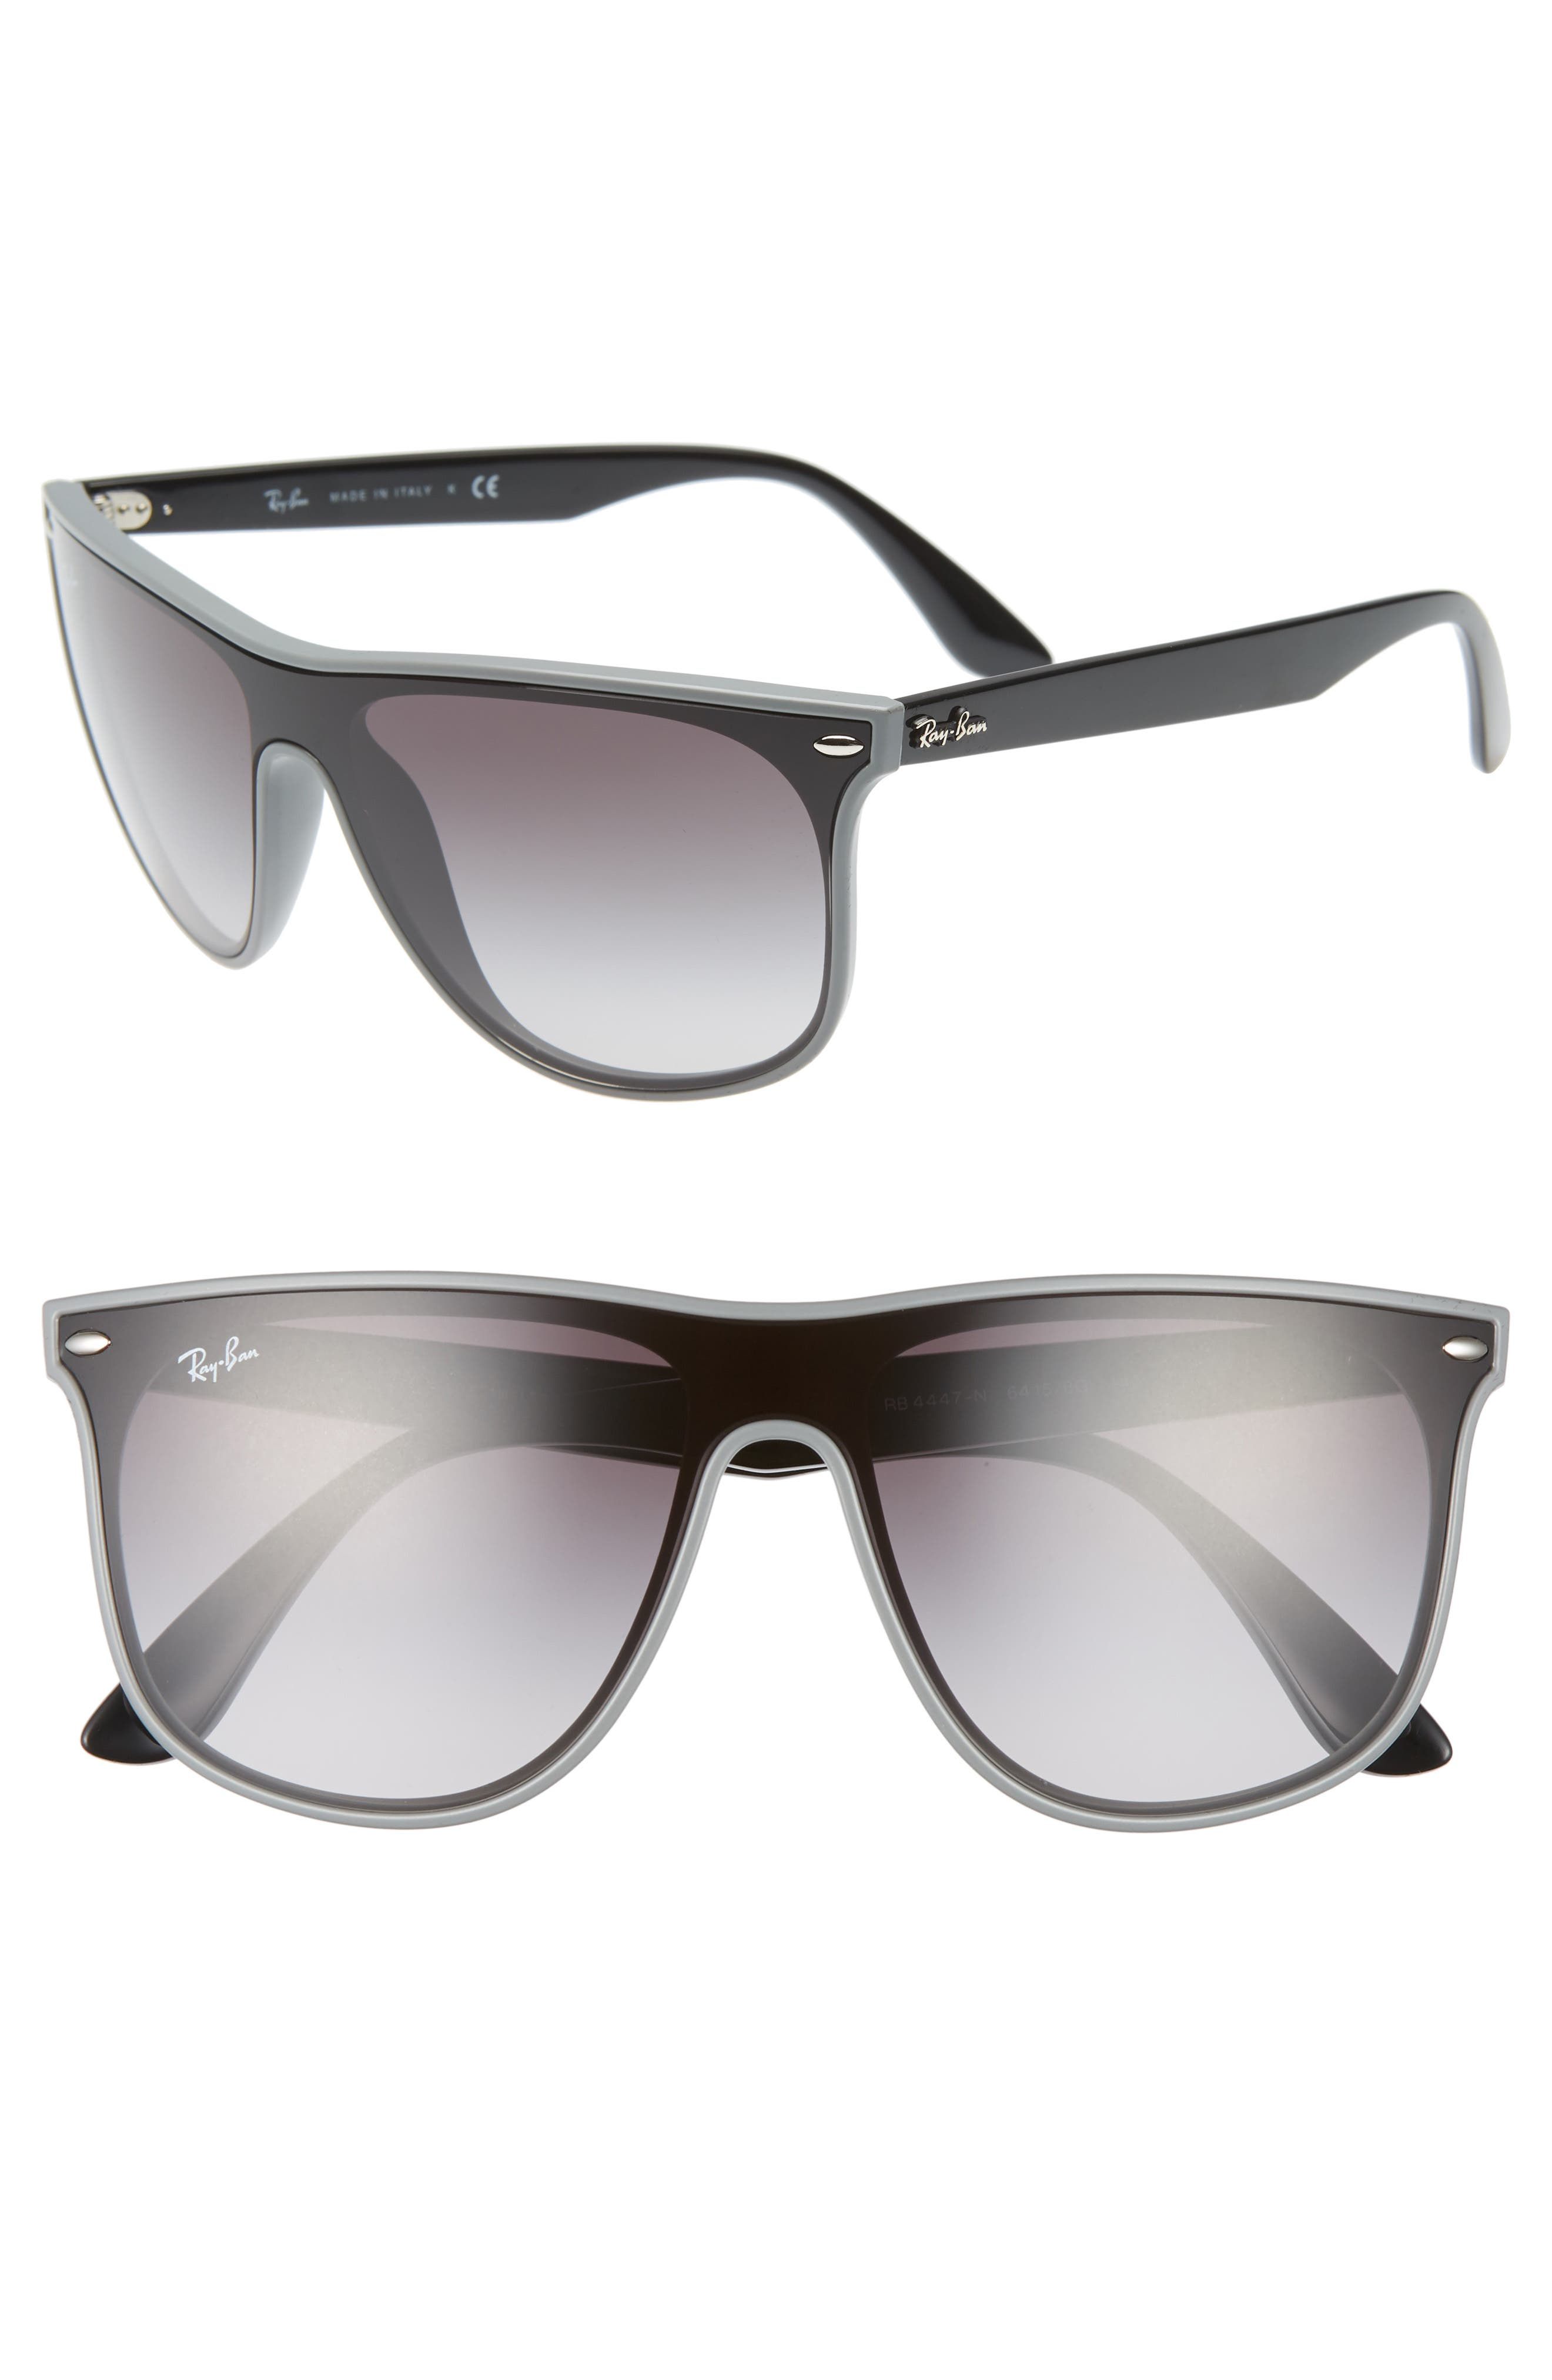 Ray-Ban Blaze 55Mm Sunglasses - Grey